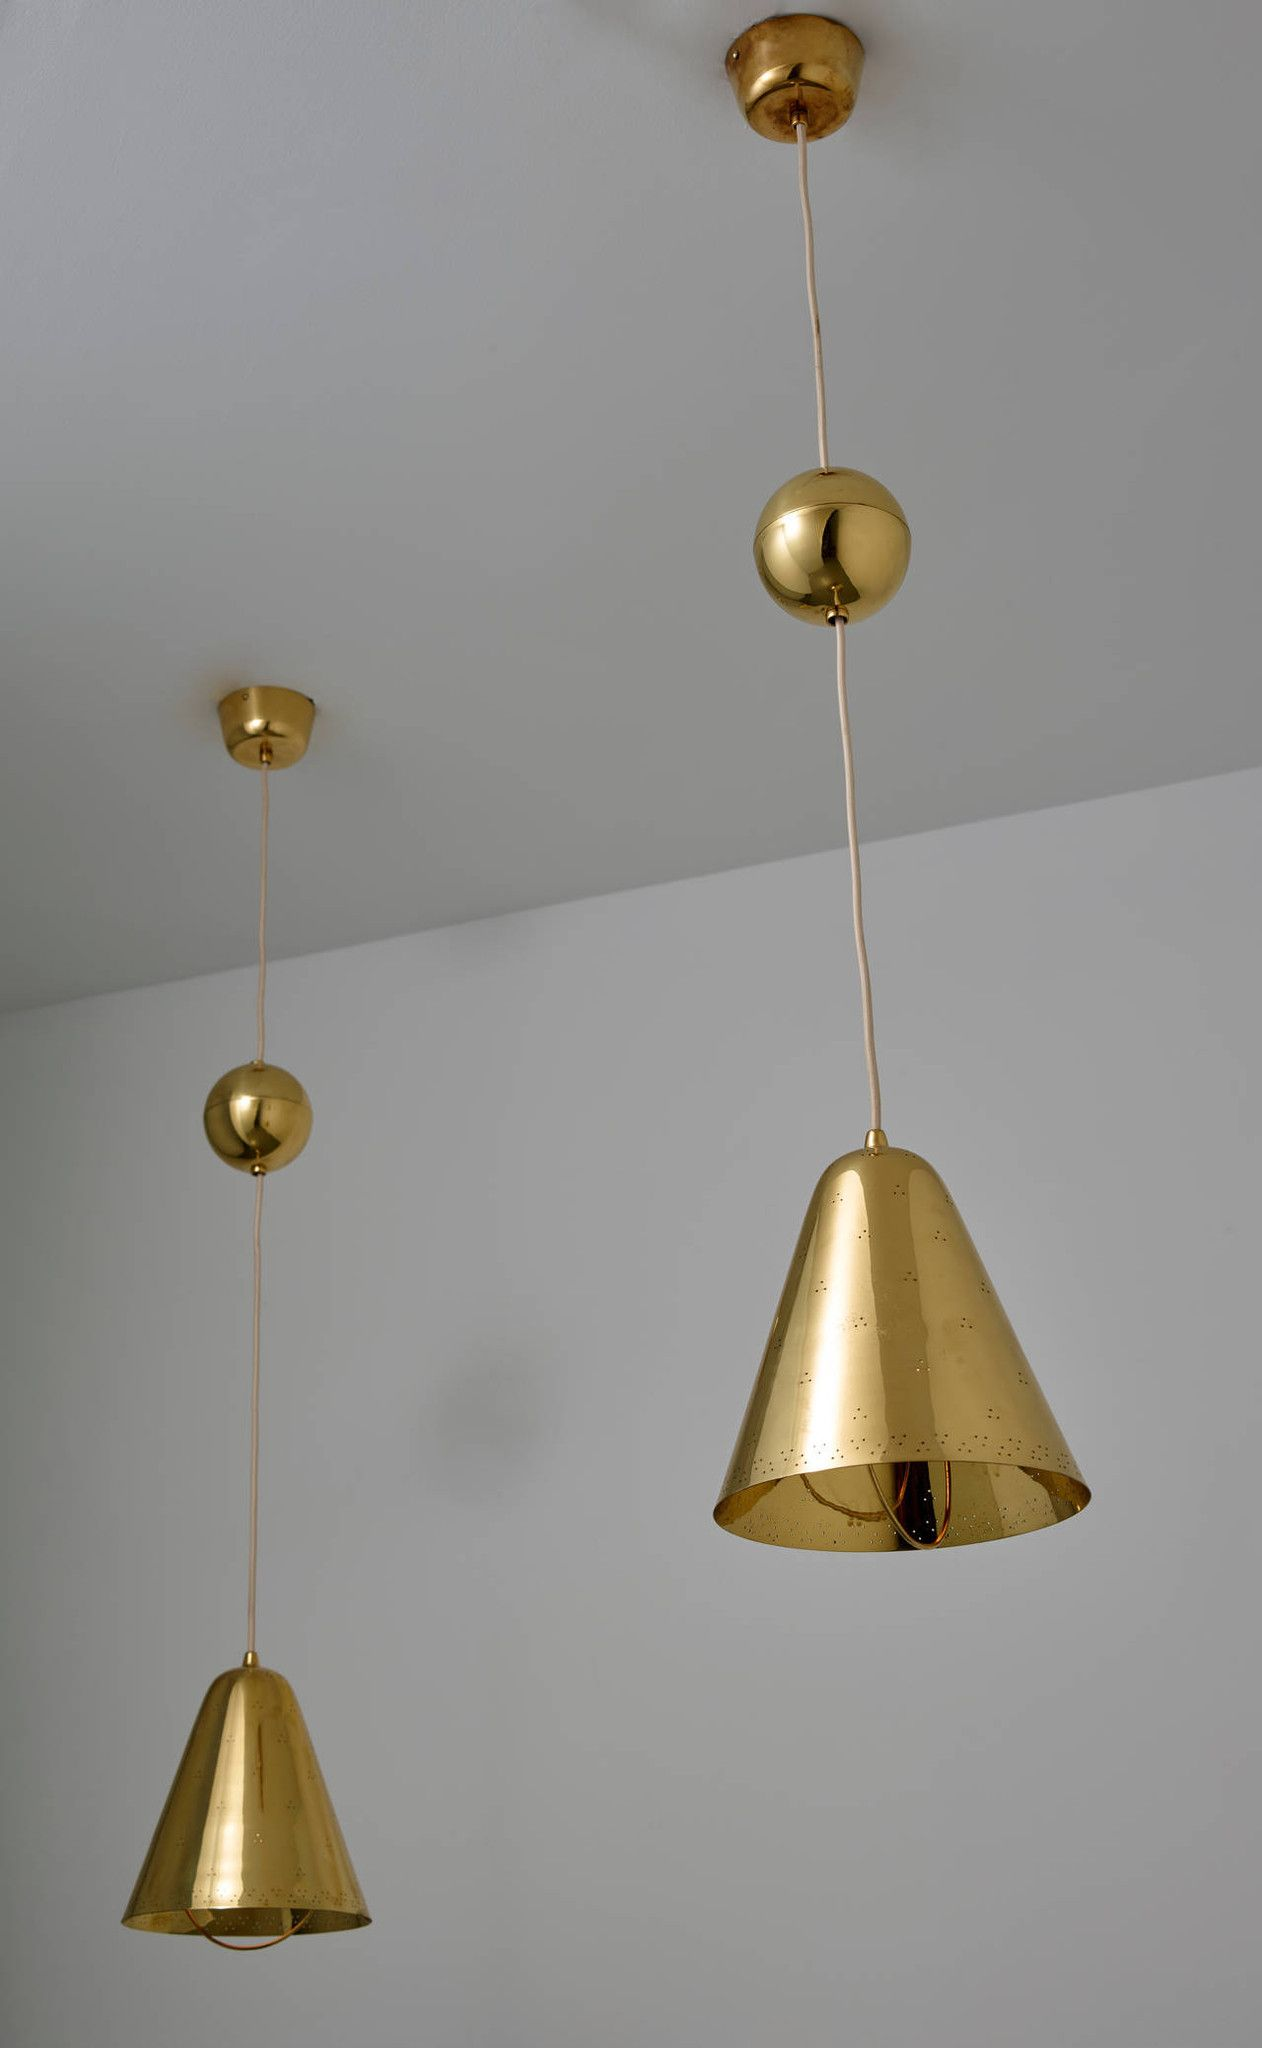 adjustable pendant lighting. Paavo Tynell, Pair Of Brass Adjustable Pendant Lights, Taito Lighting M